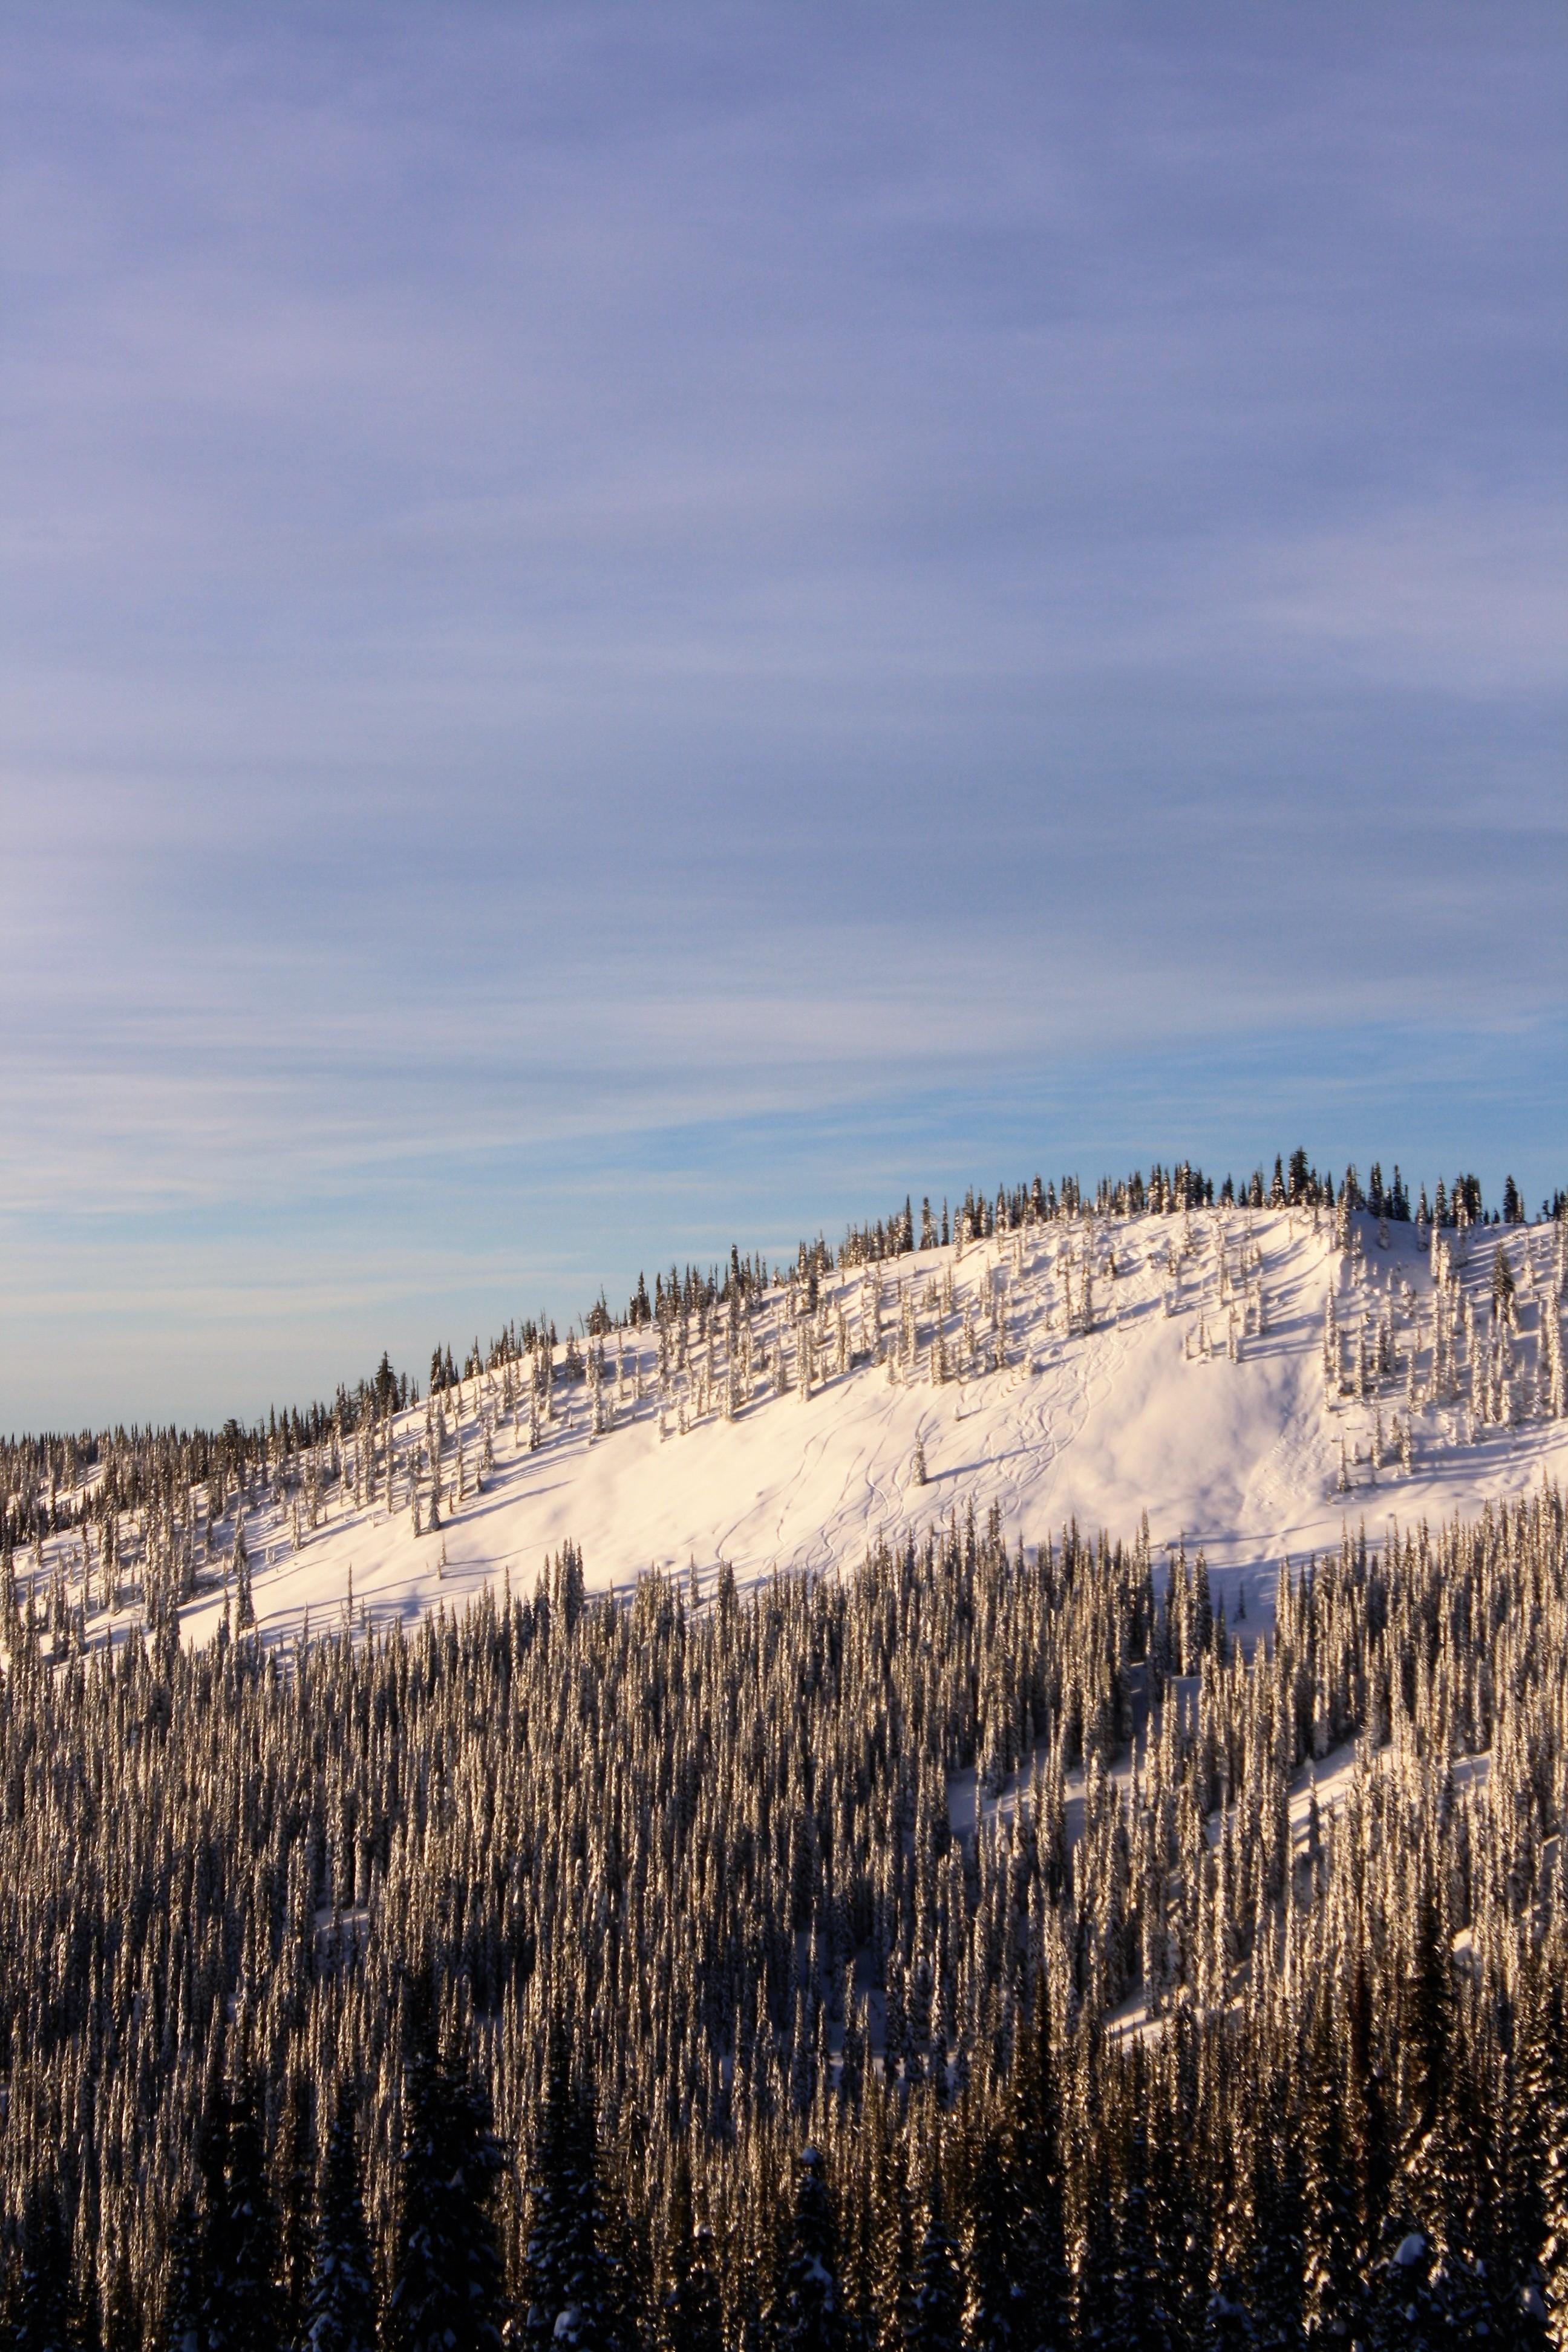 DM_nature_winter_kootenays_1742